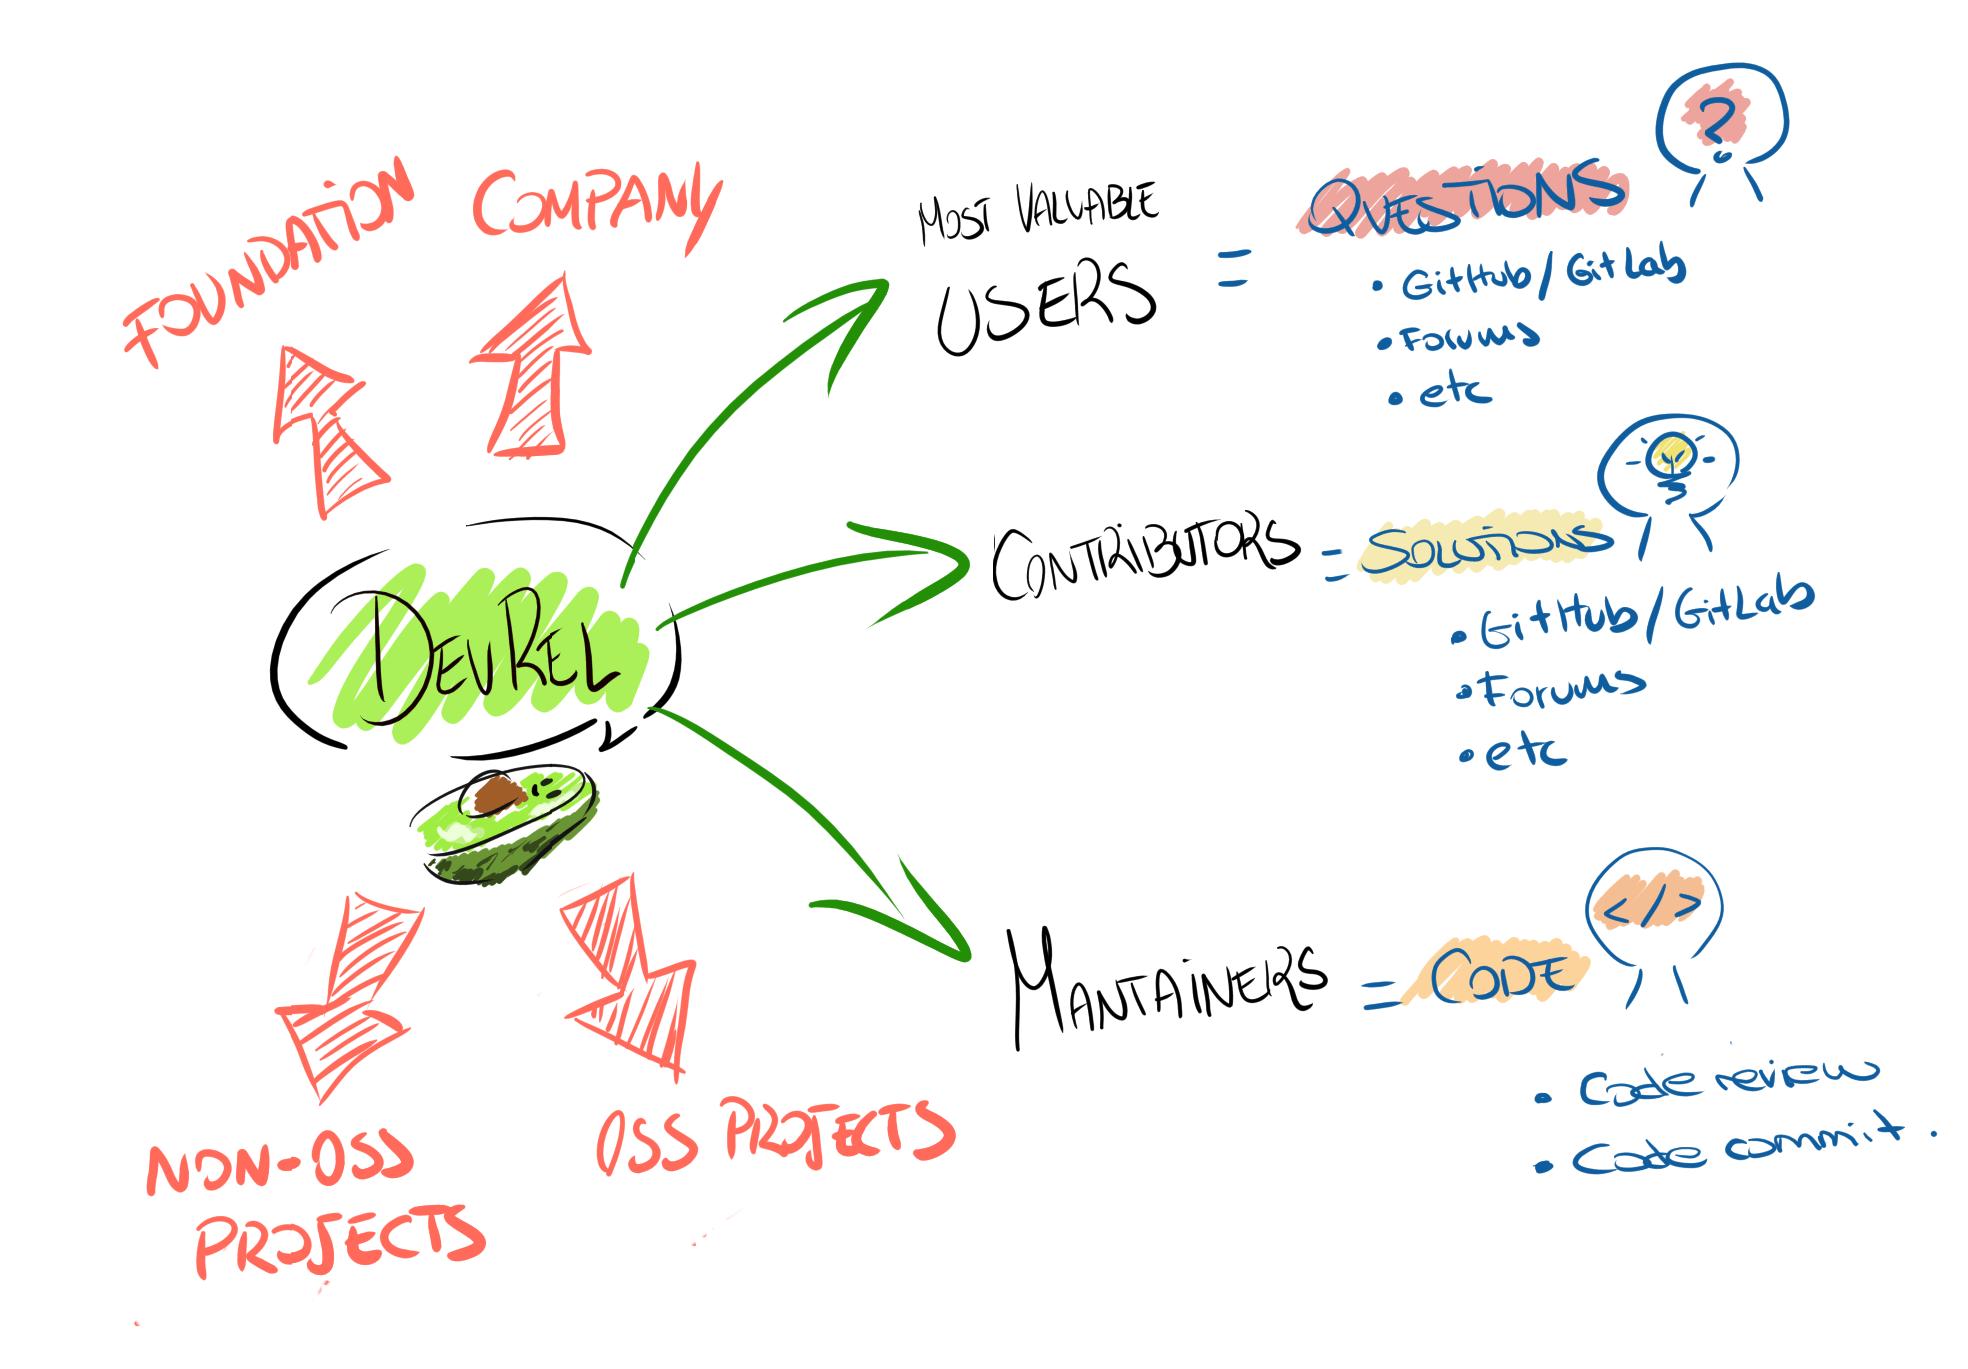 KPIs and metrics for DevRel Programs